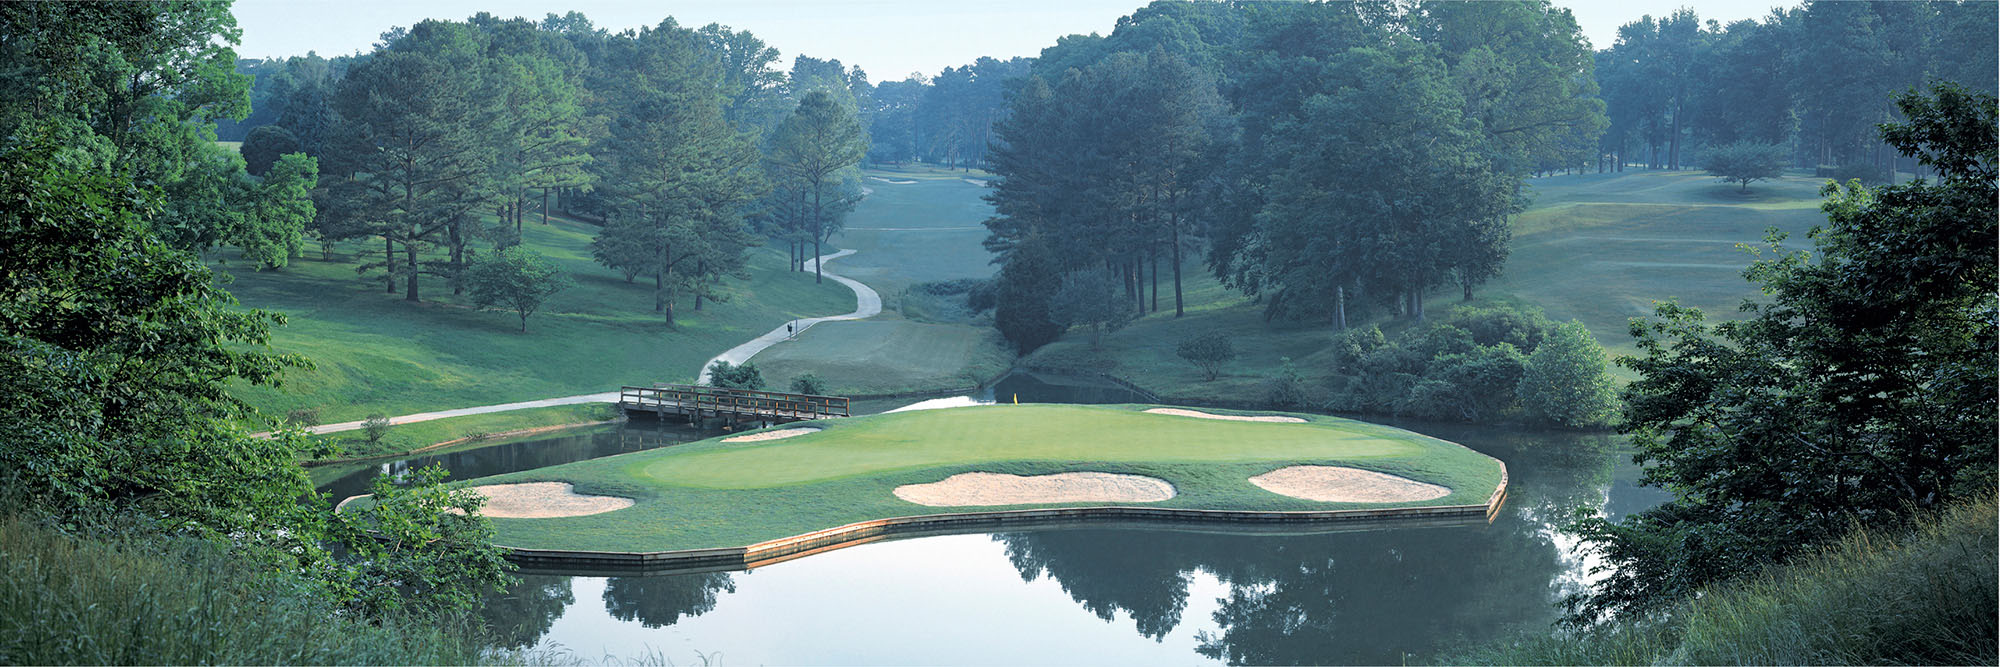 Golf Course Image - Golden Horseshoe No. 16